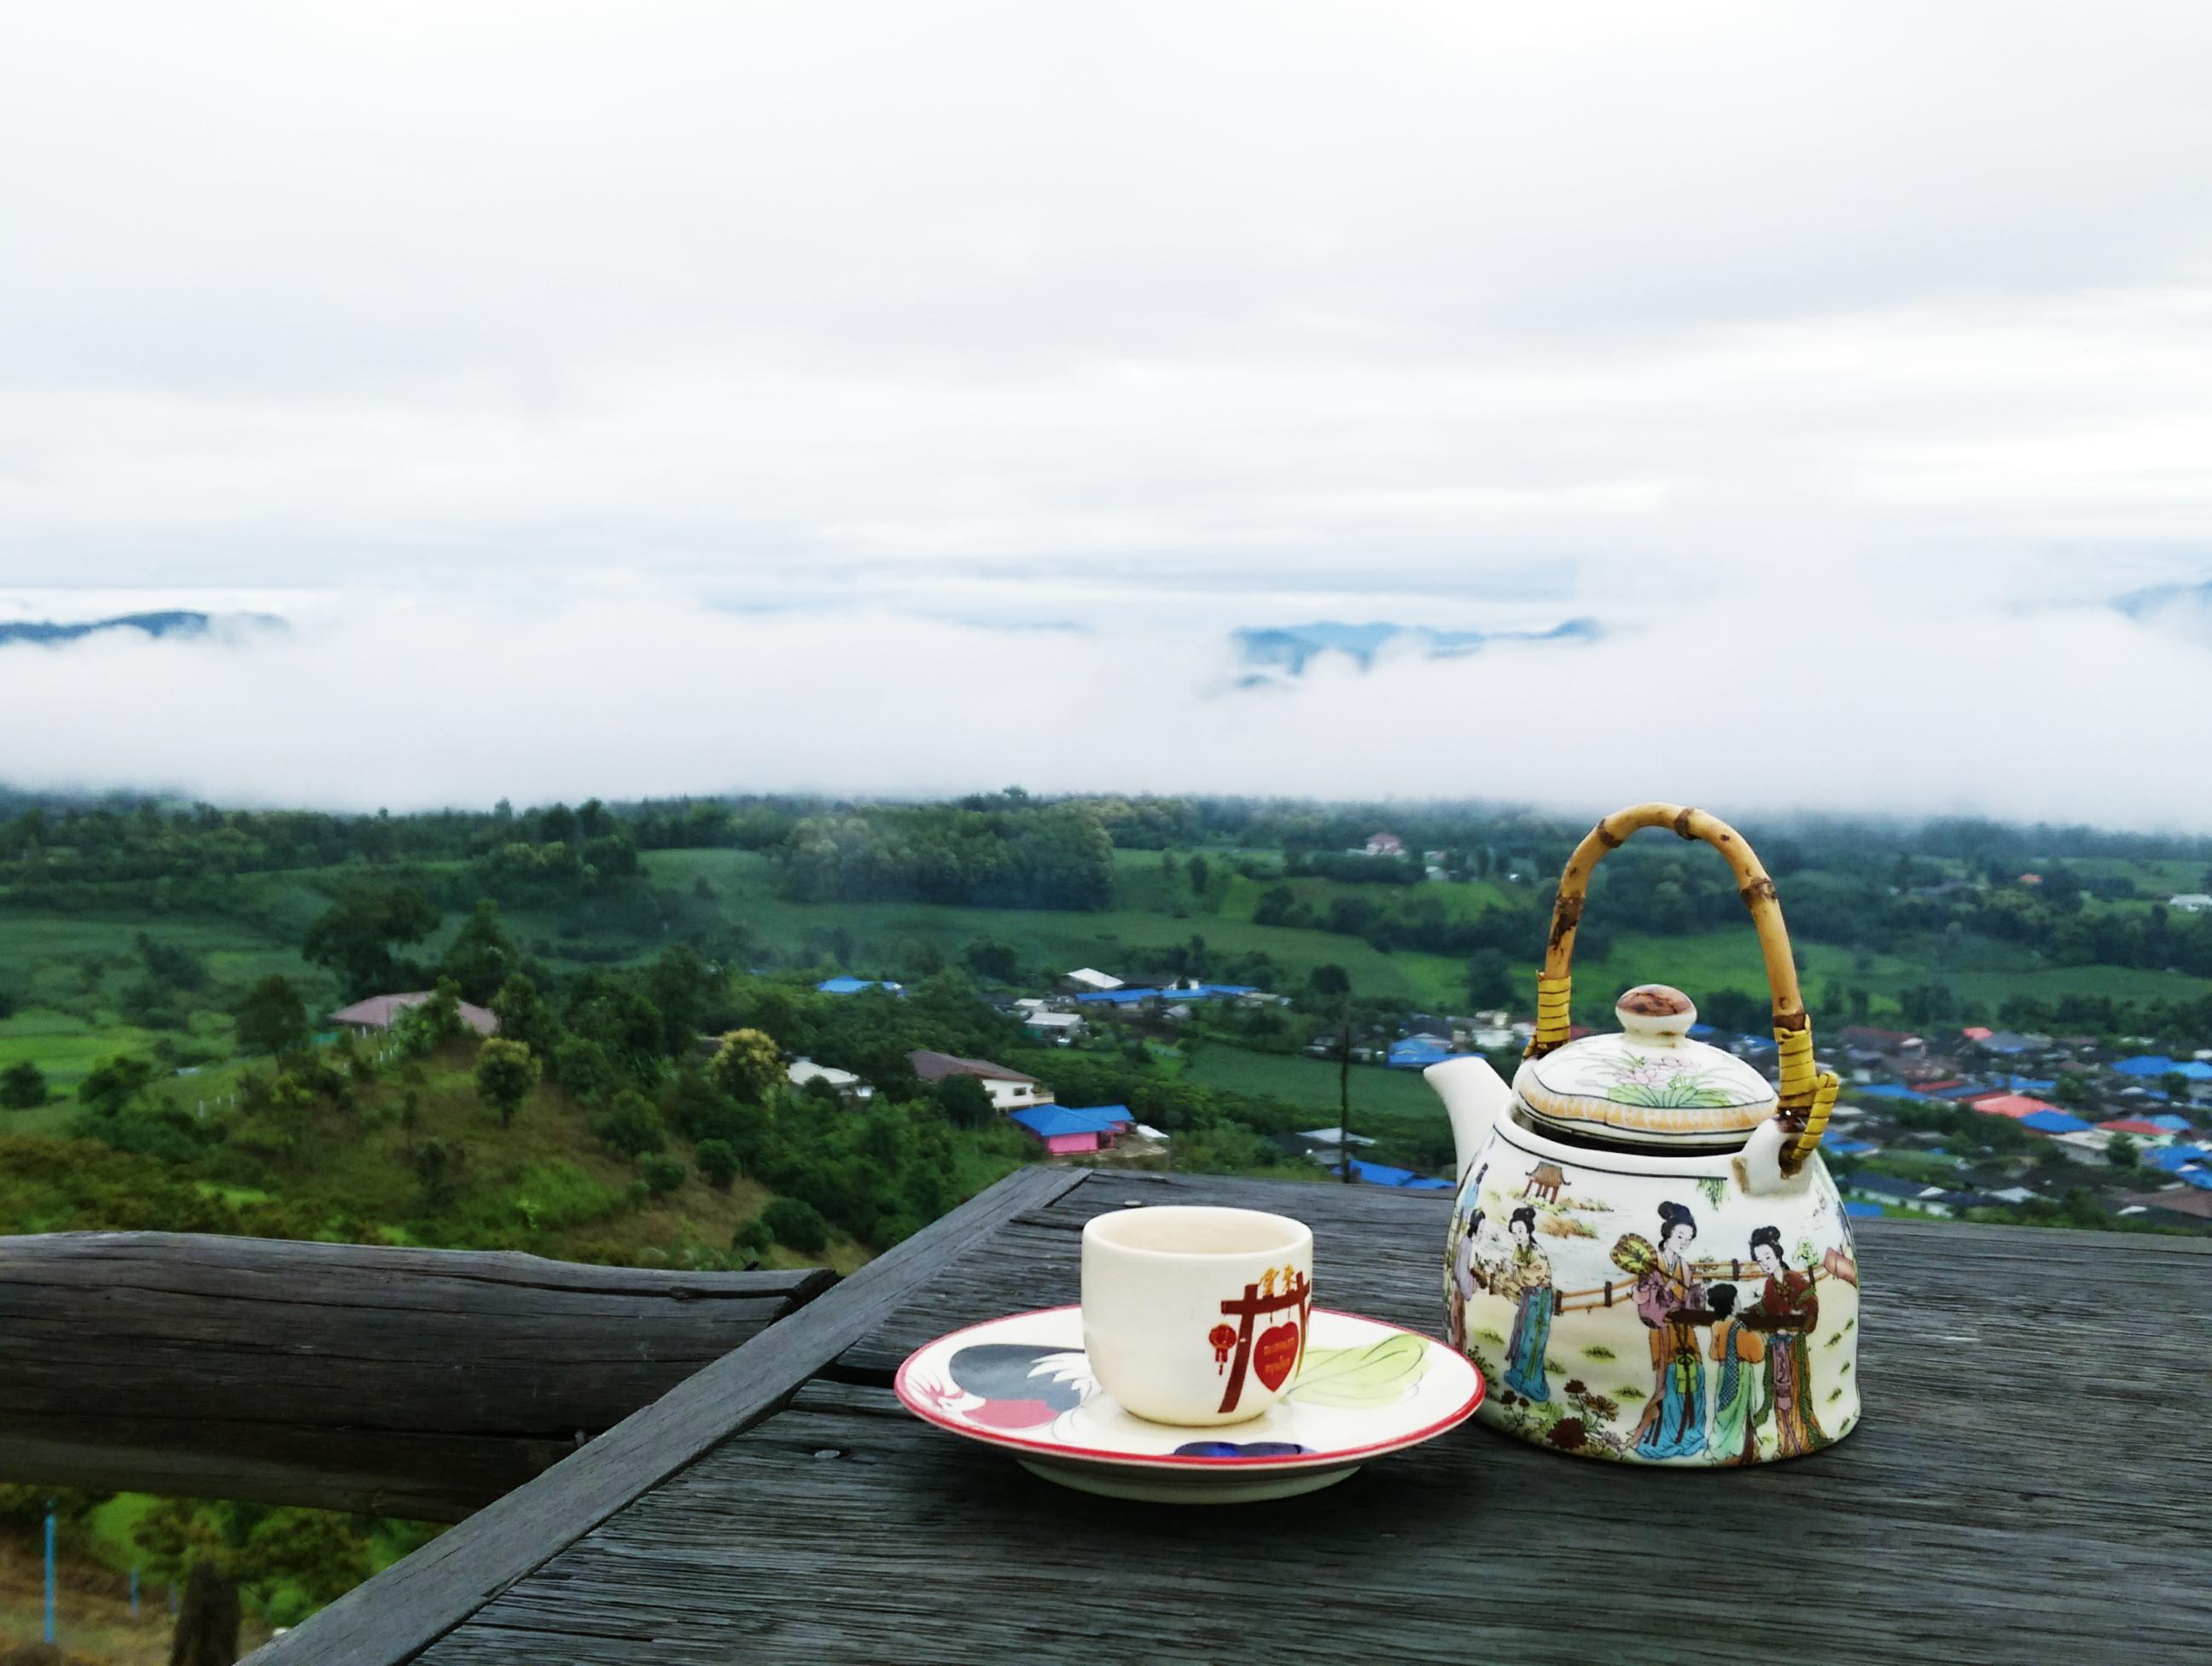 yunlai viewpoint pai